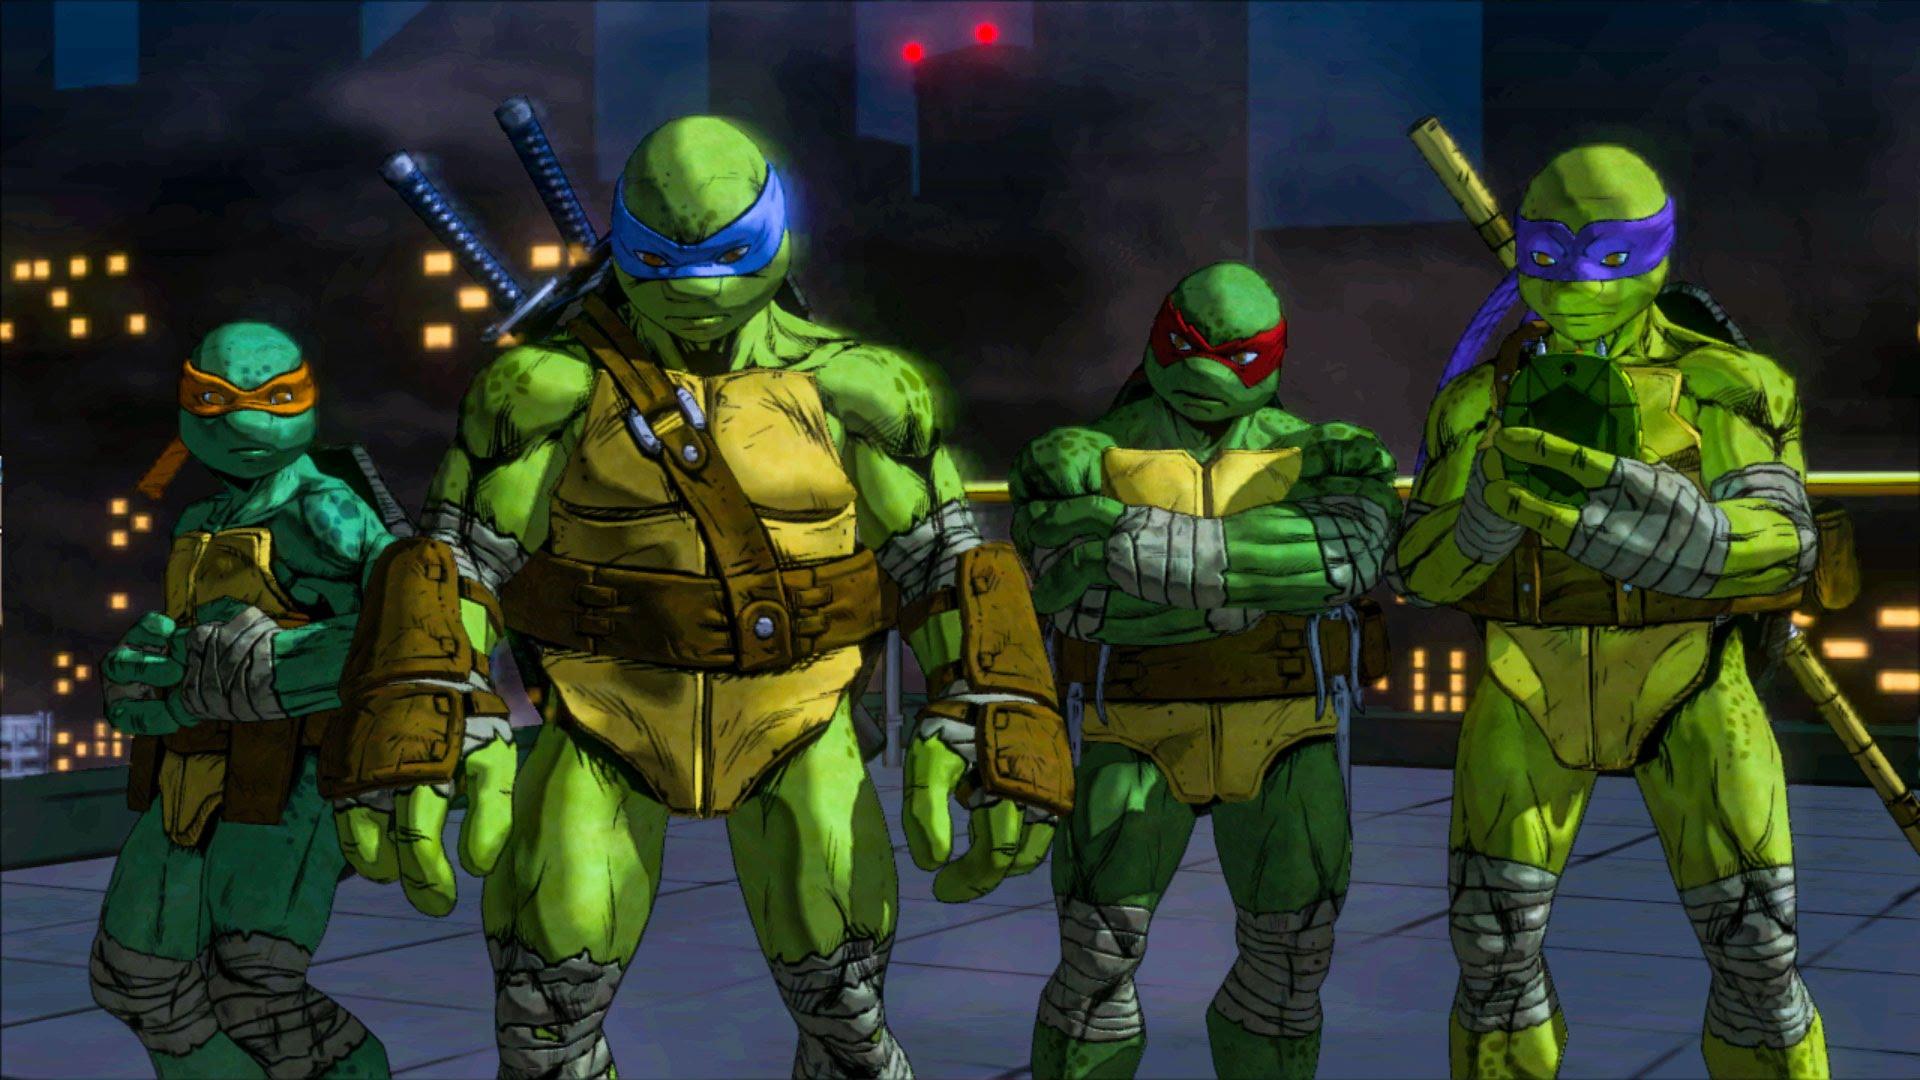 Retro review teenage mutant ninja turtles ii secret of the ooze - Mutantsinmanhattan1 Mutants